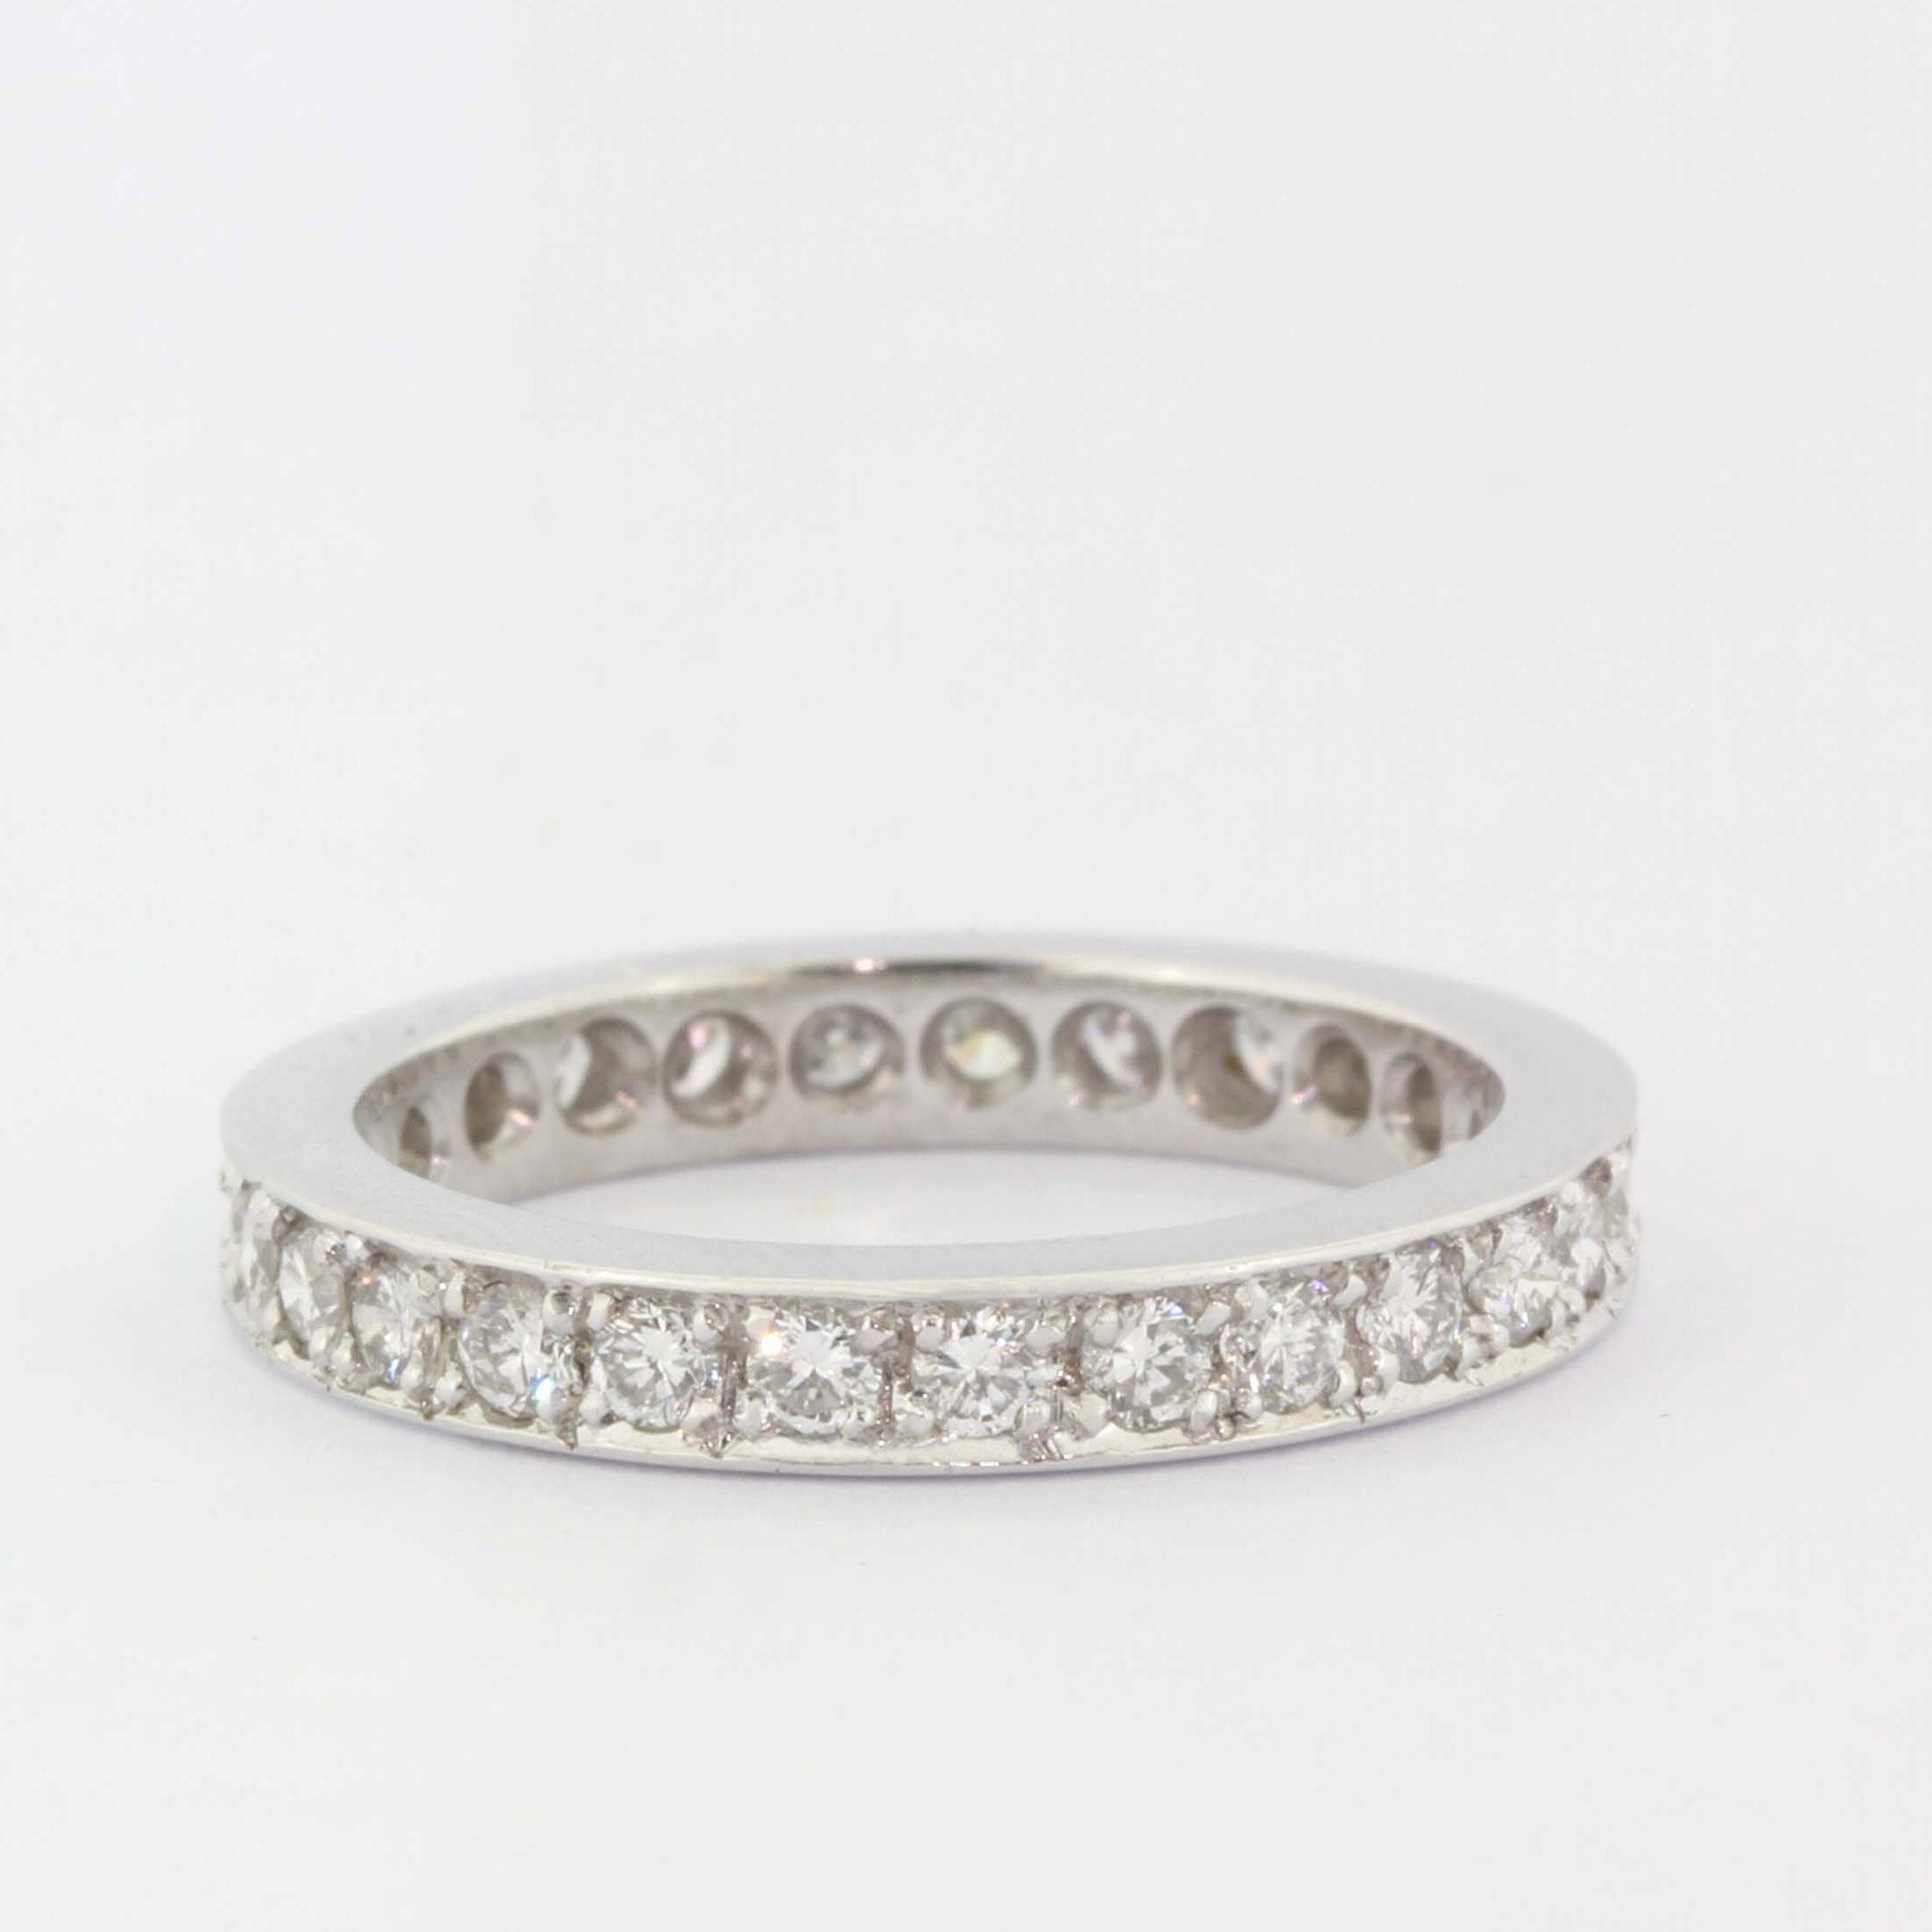 eternity-ring-5-ring-catalogue-david-batchelor-jeweller-jewellery-design-catalogue-durban-portfolio